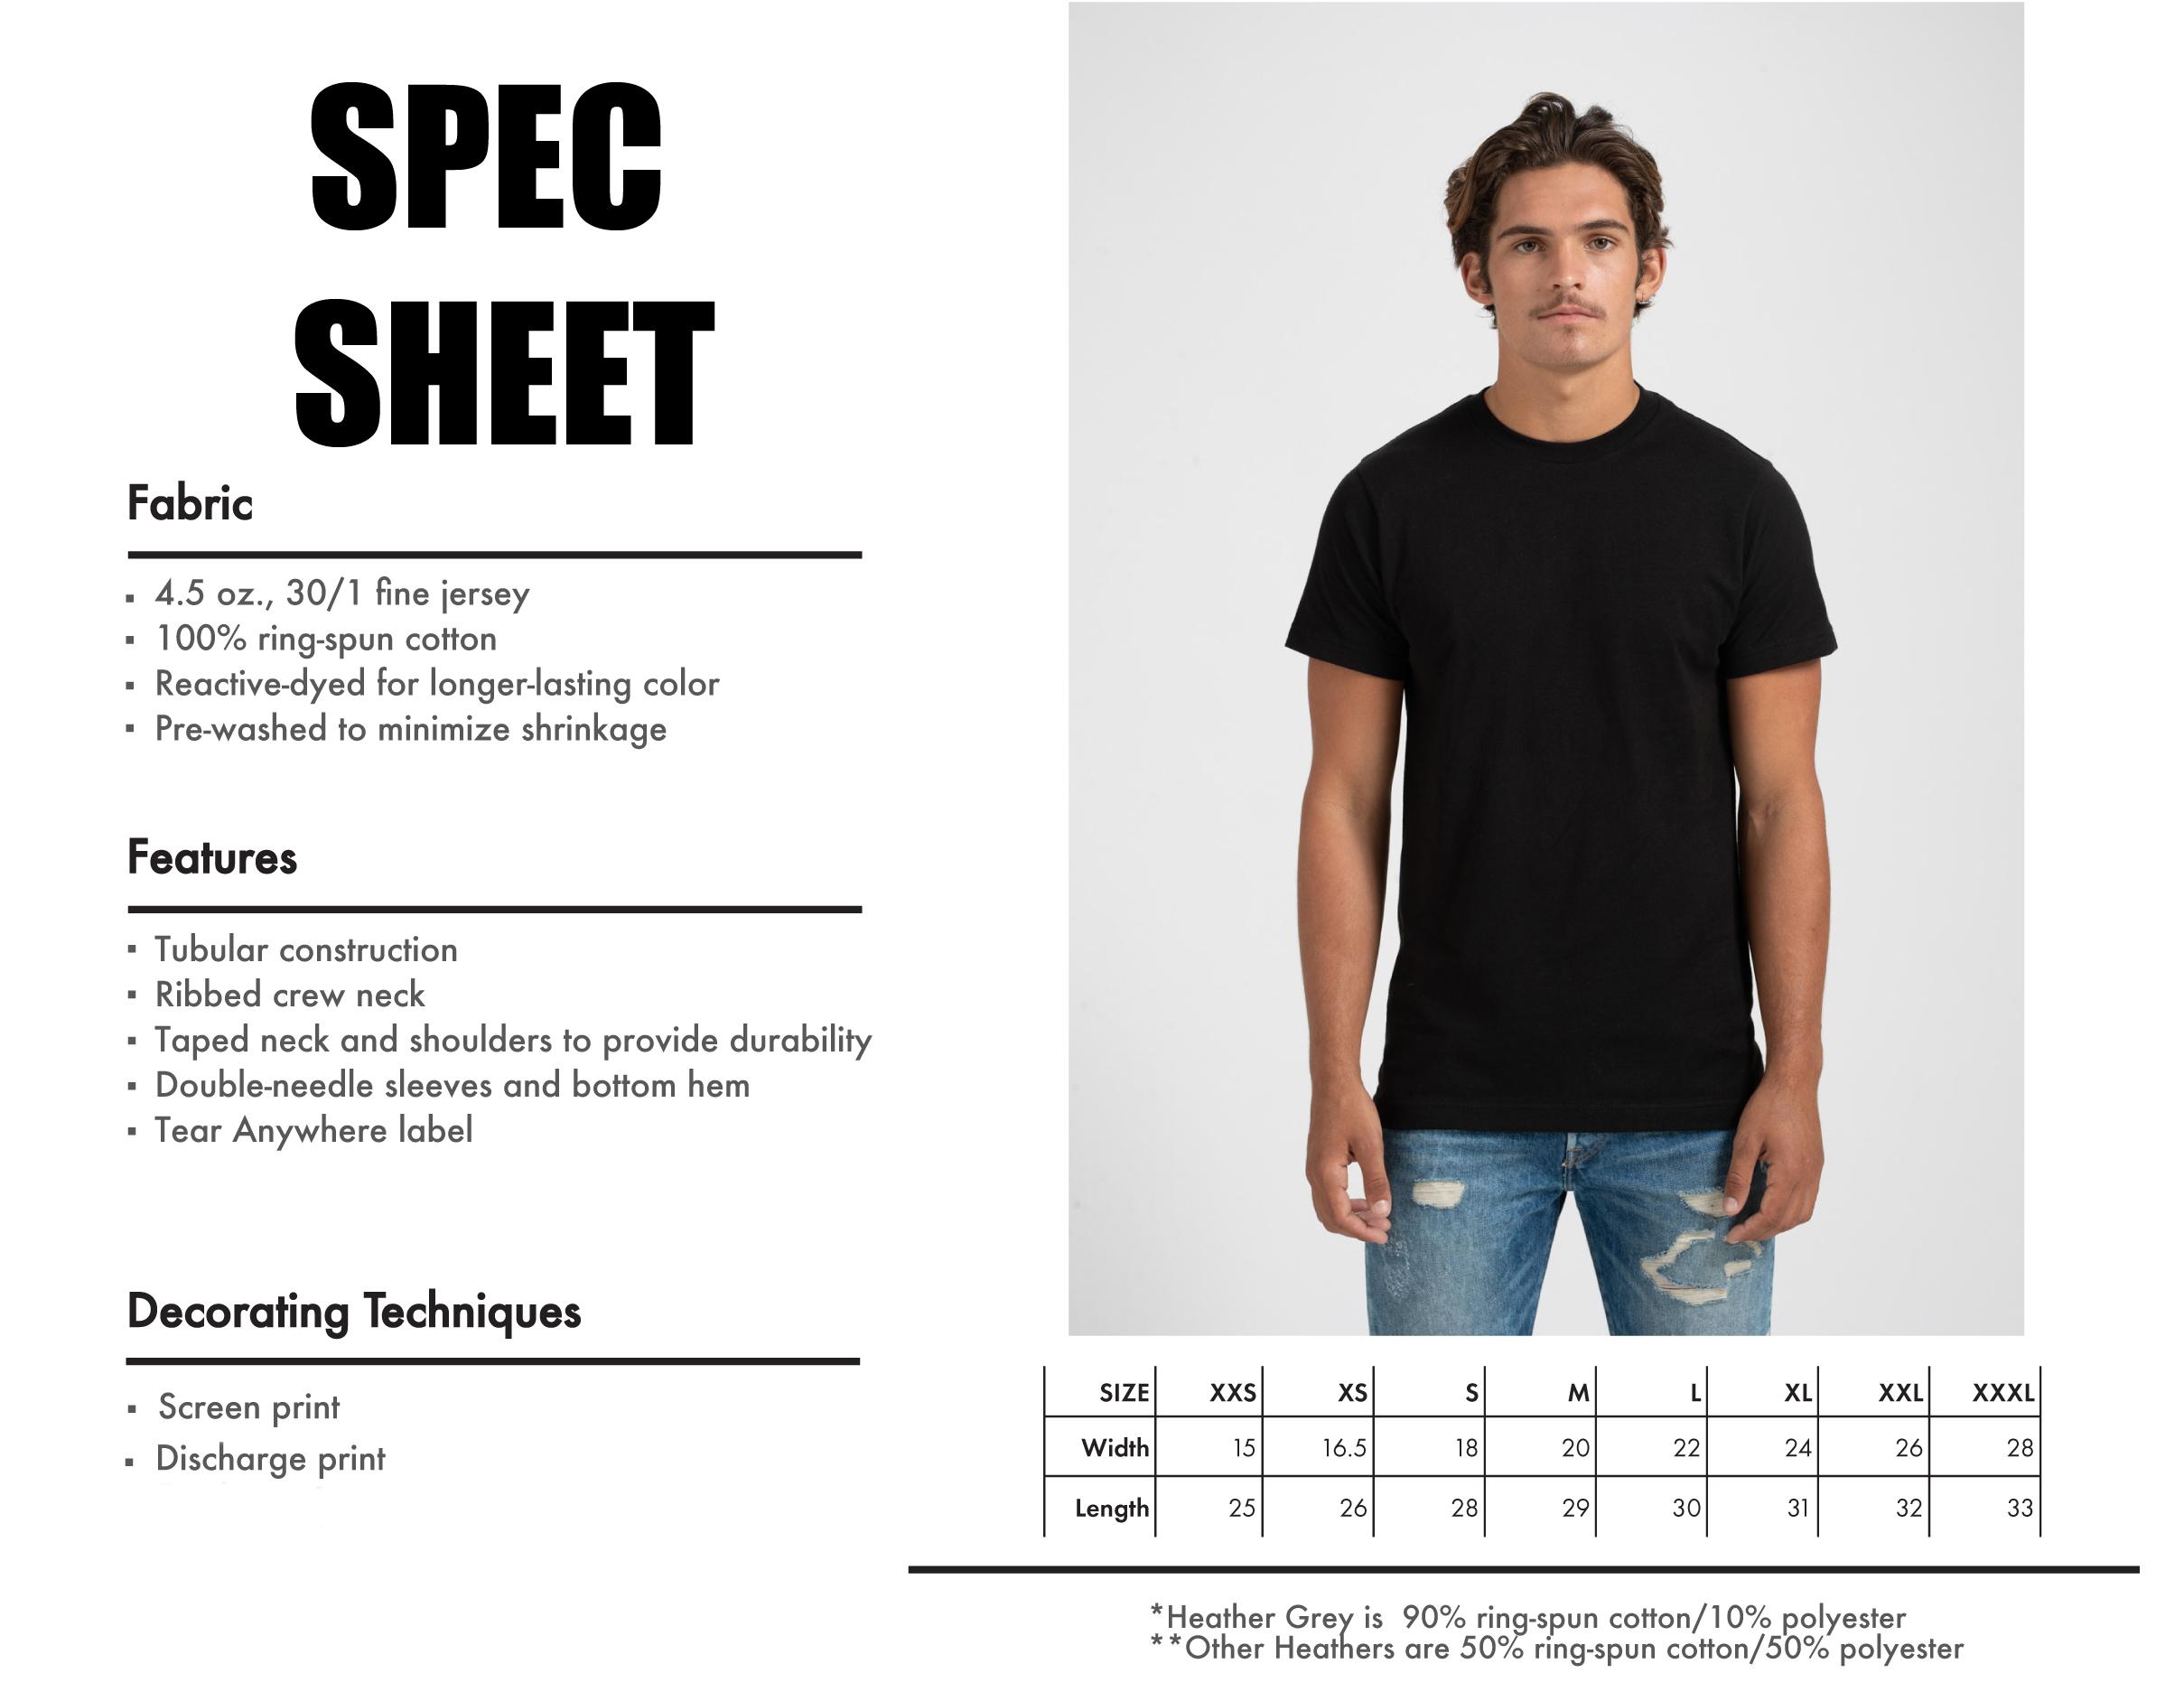 202-spec-sheet-2020-copy.jpg